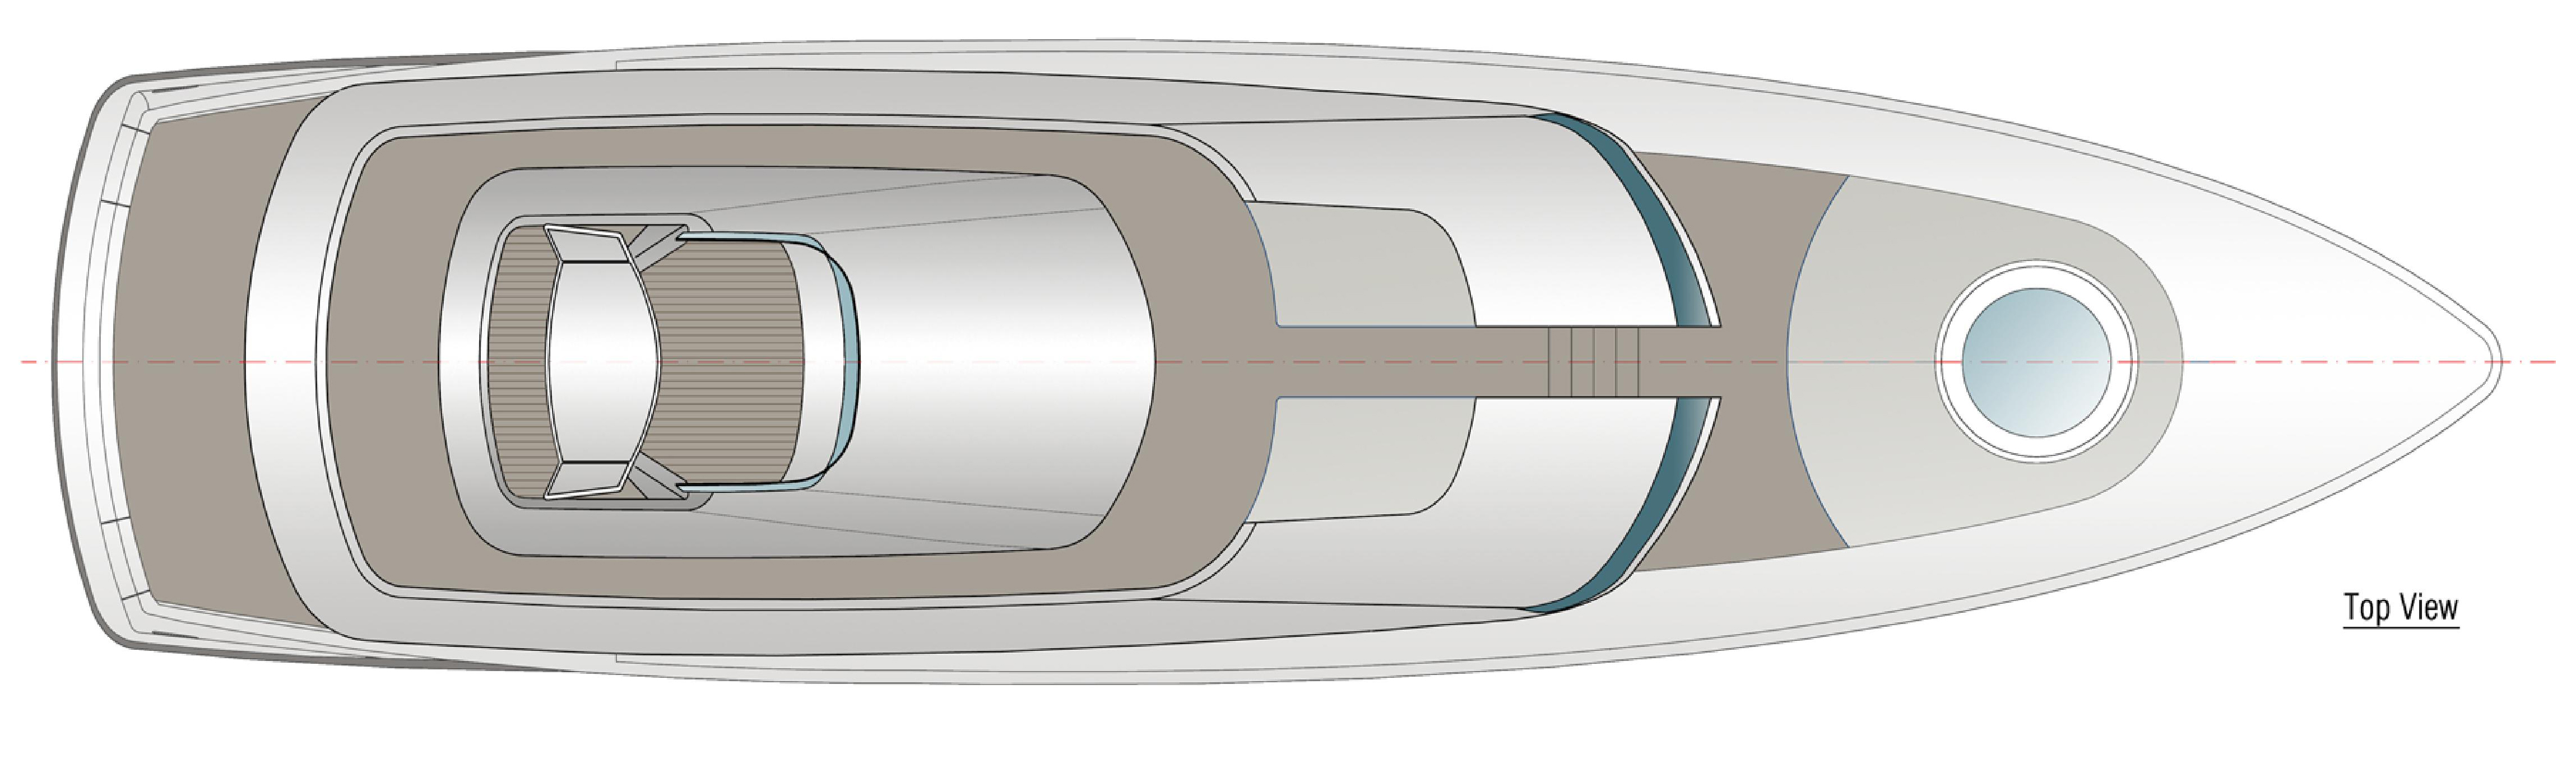 24m Yacht Fisherman Concept GA Top View